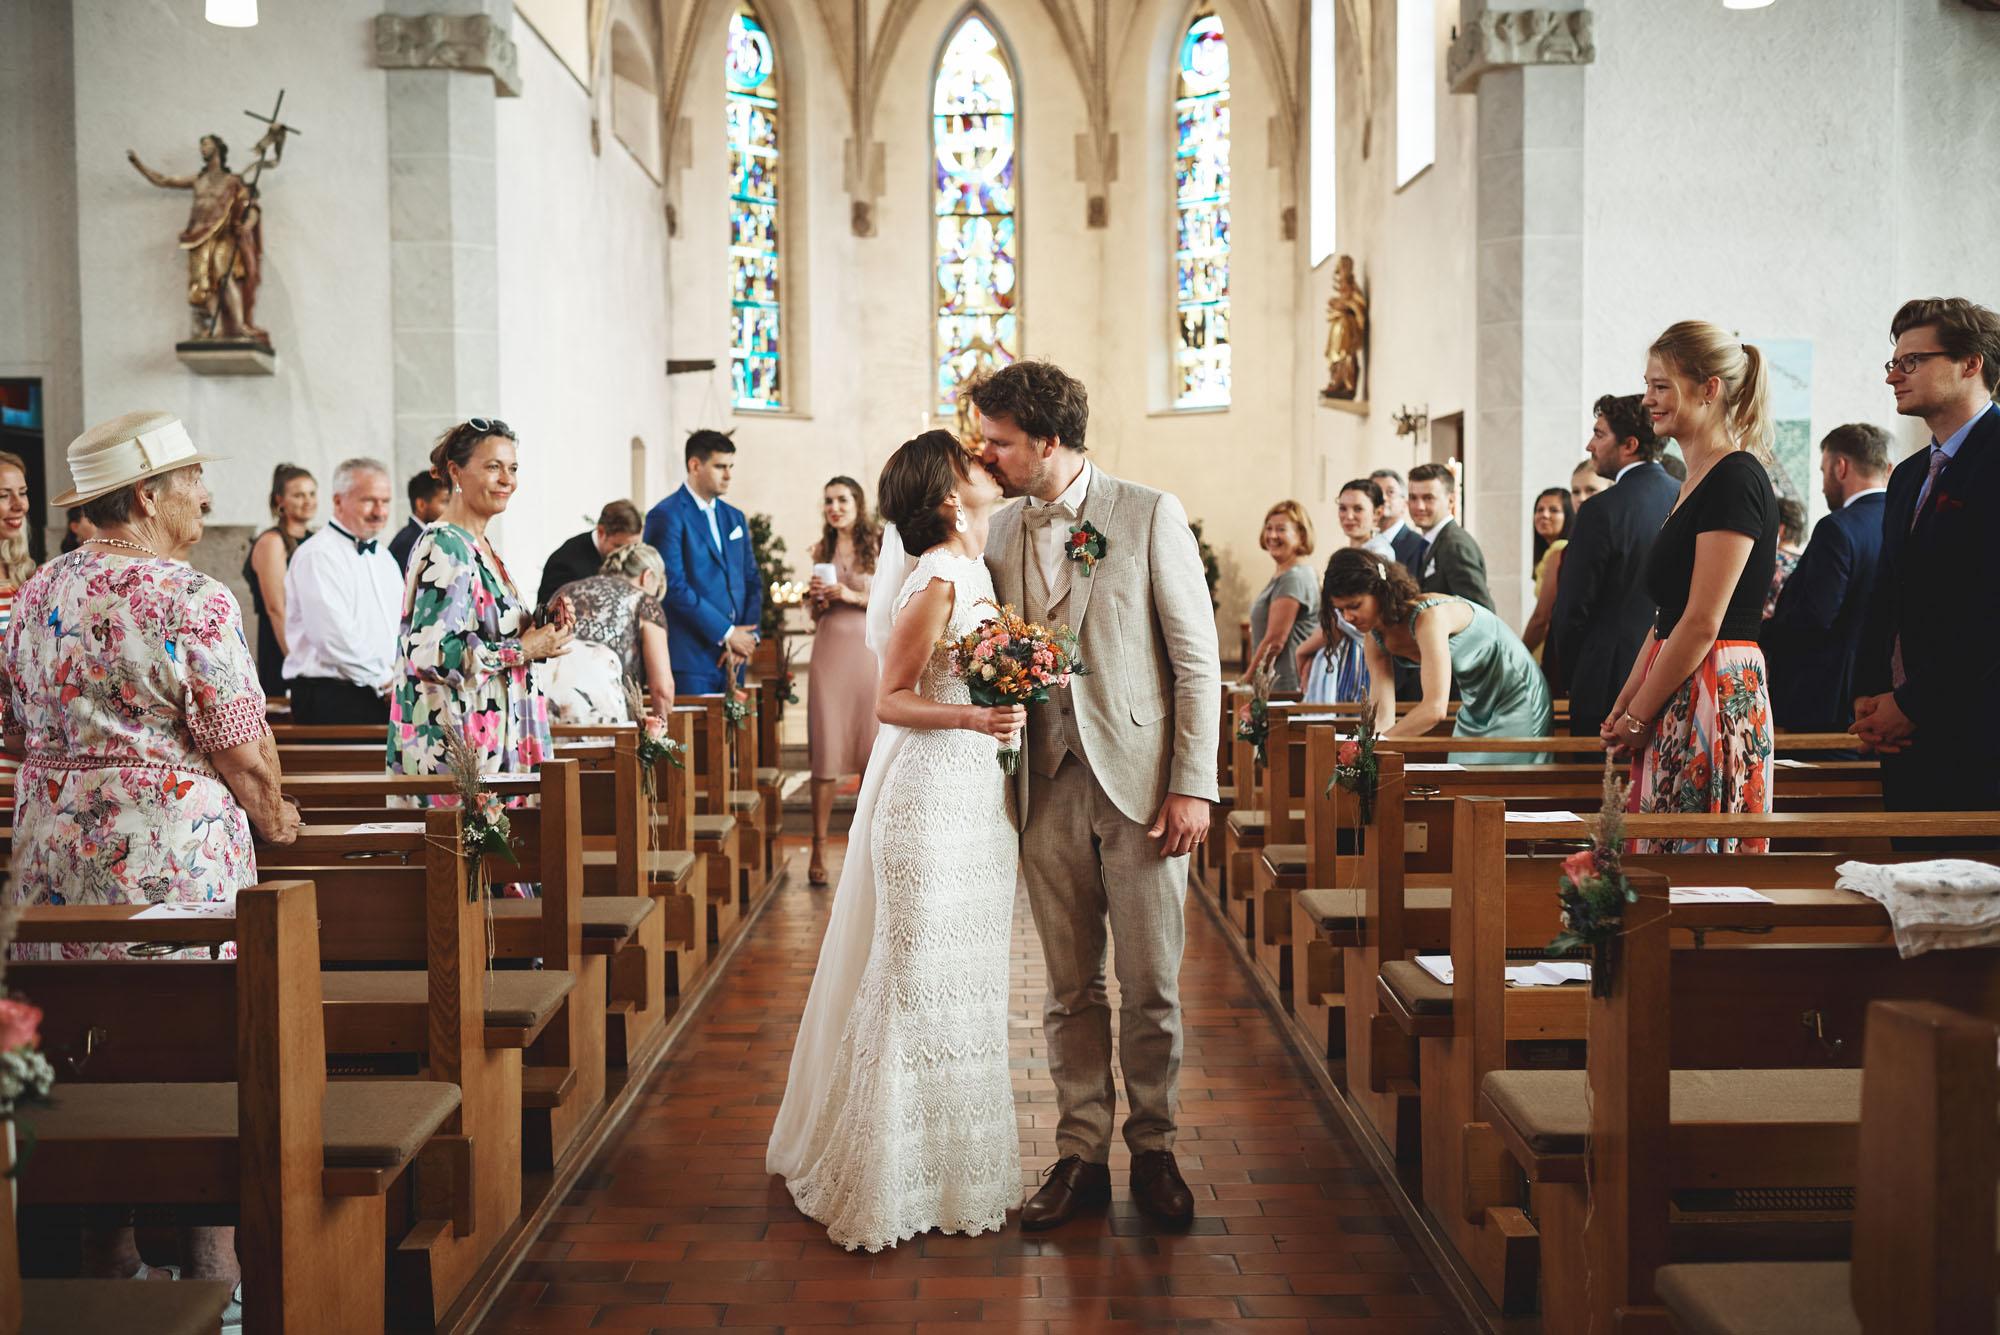 Martin Spoerl Potography Hochzeit Ailinger Muehle 0029